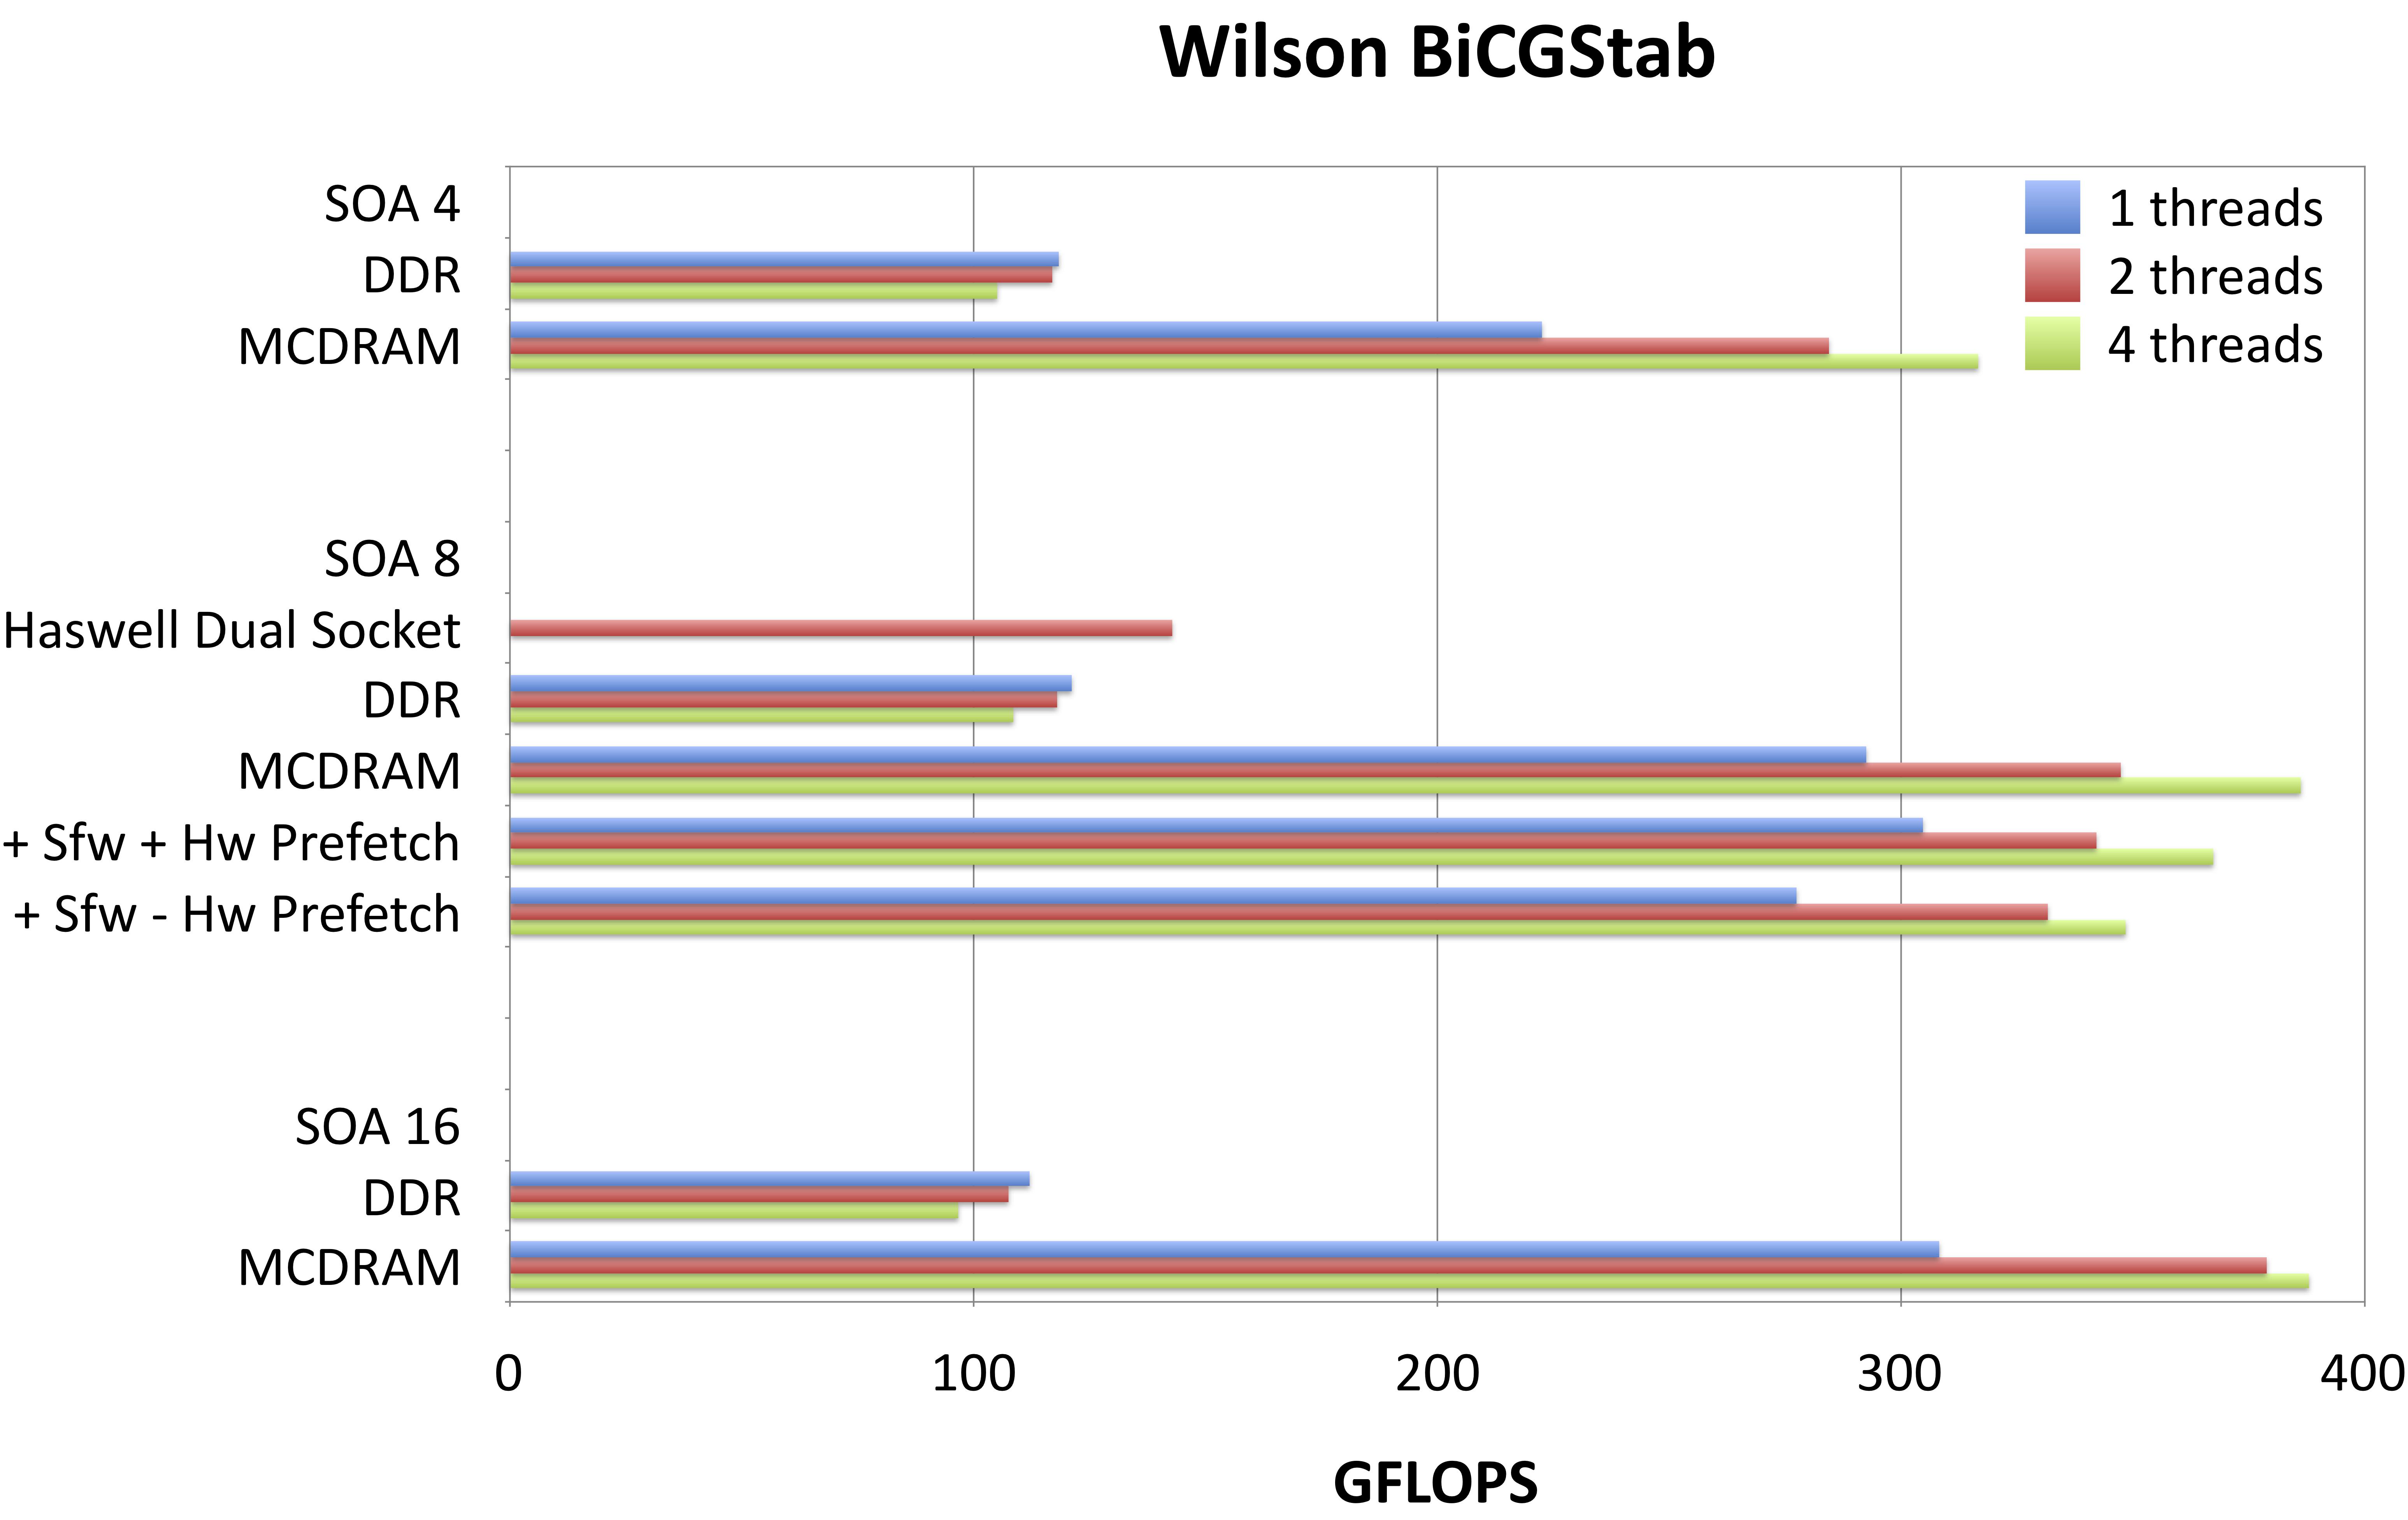 docs/performance/case-studies/qphix/images/wilson_bicgstab_lf.png